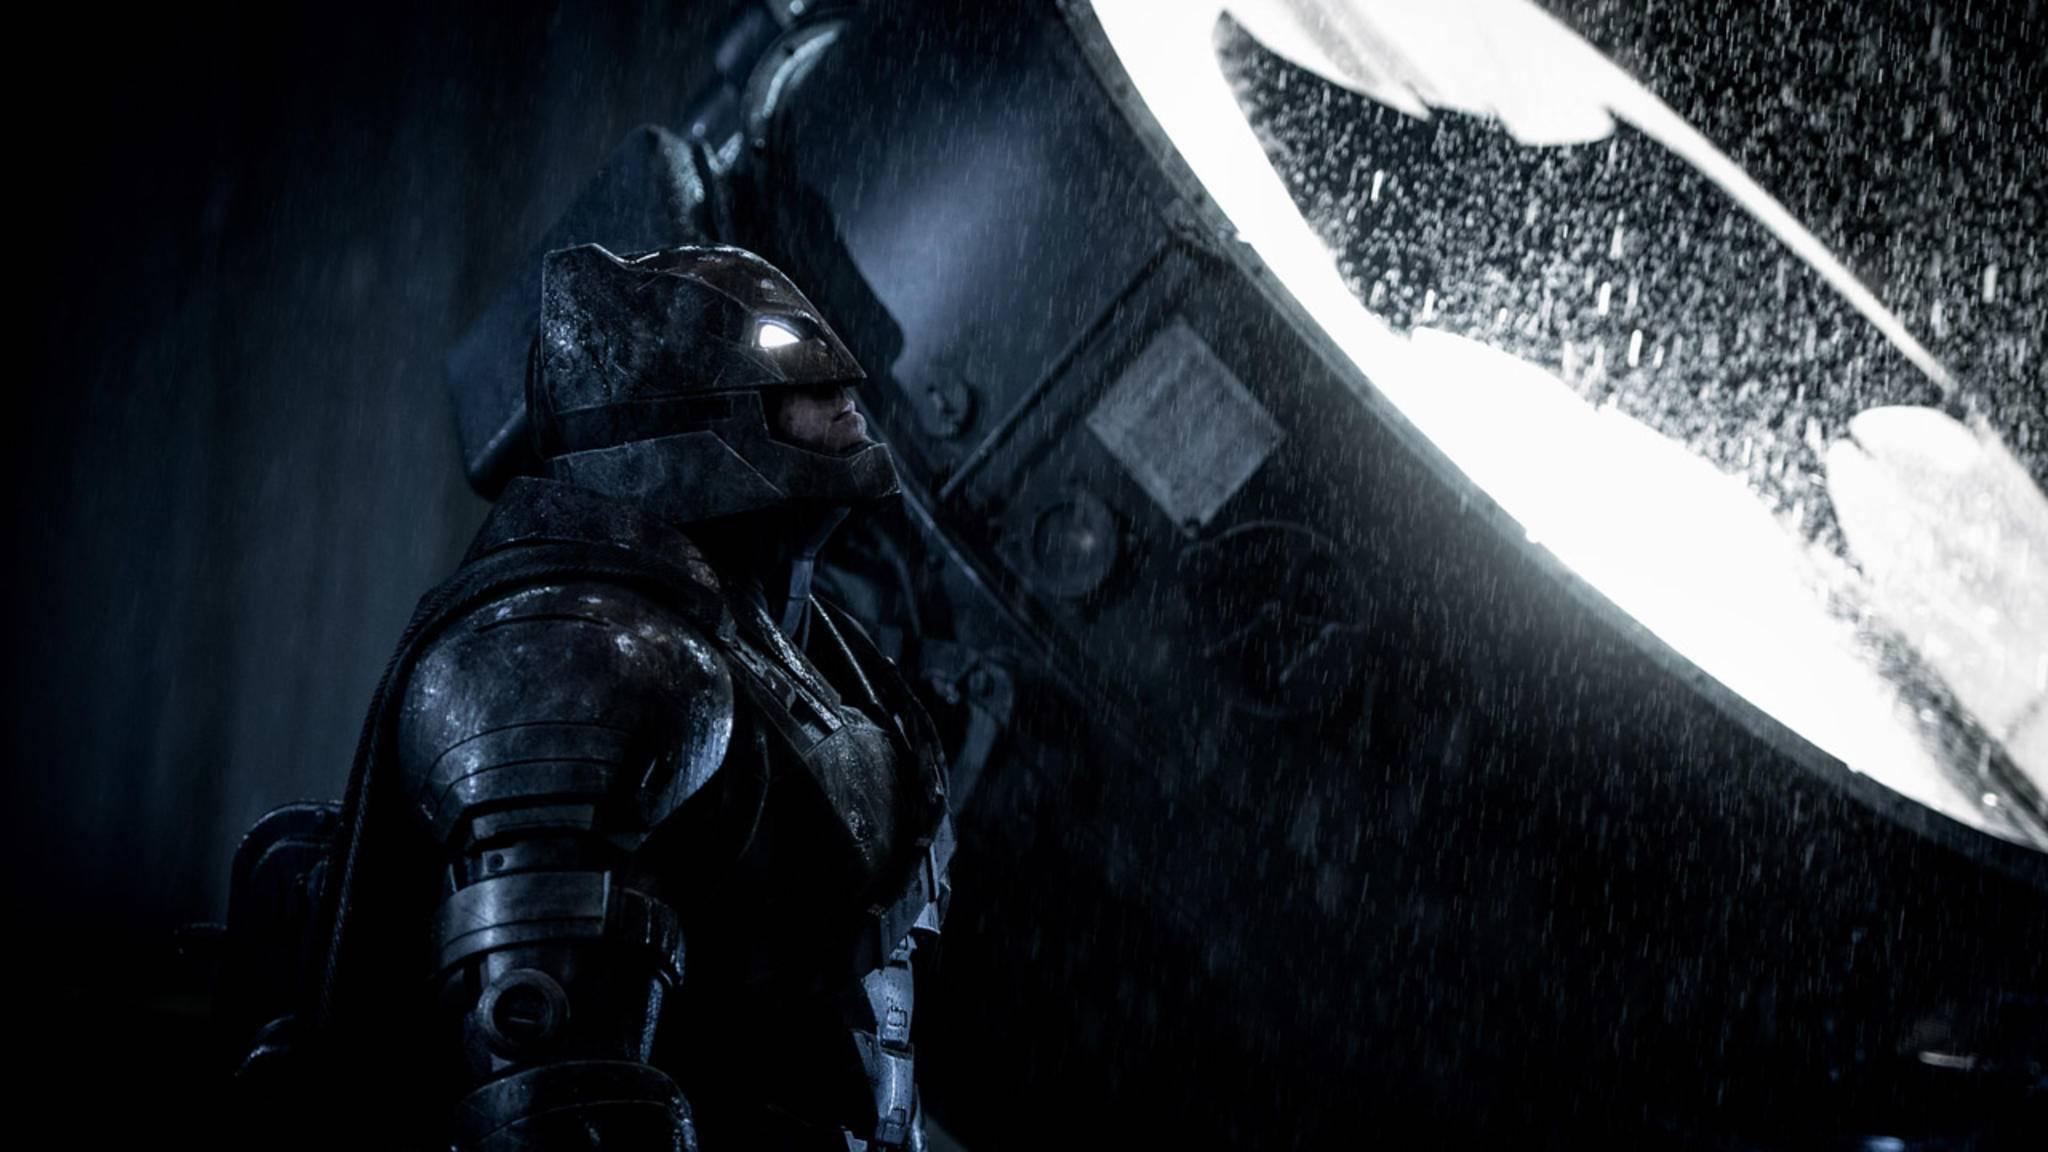 Blickt Batman seinem persönlichen Highlight-Jahr entgegen?